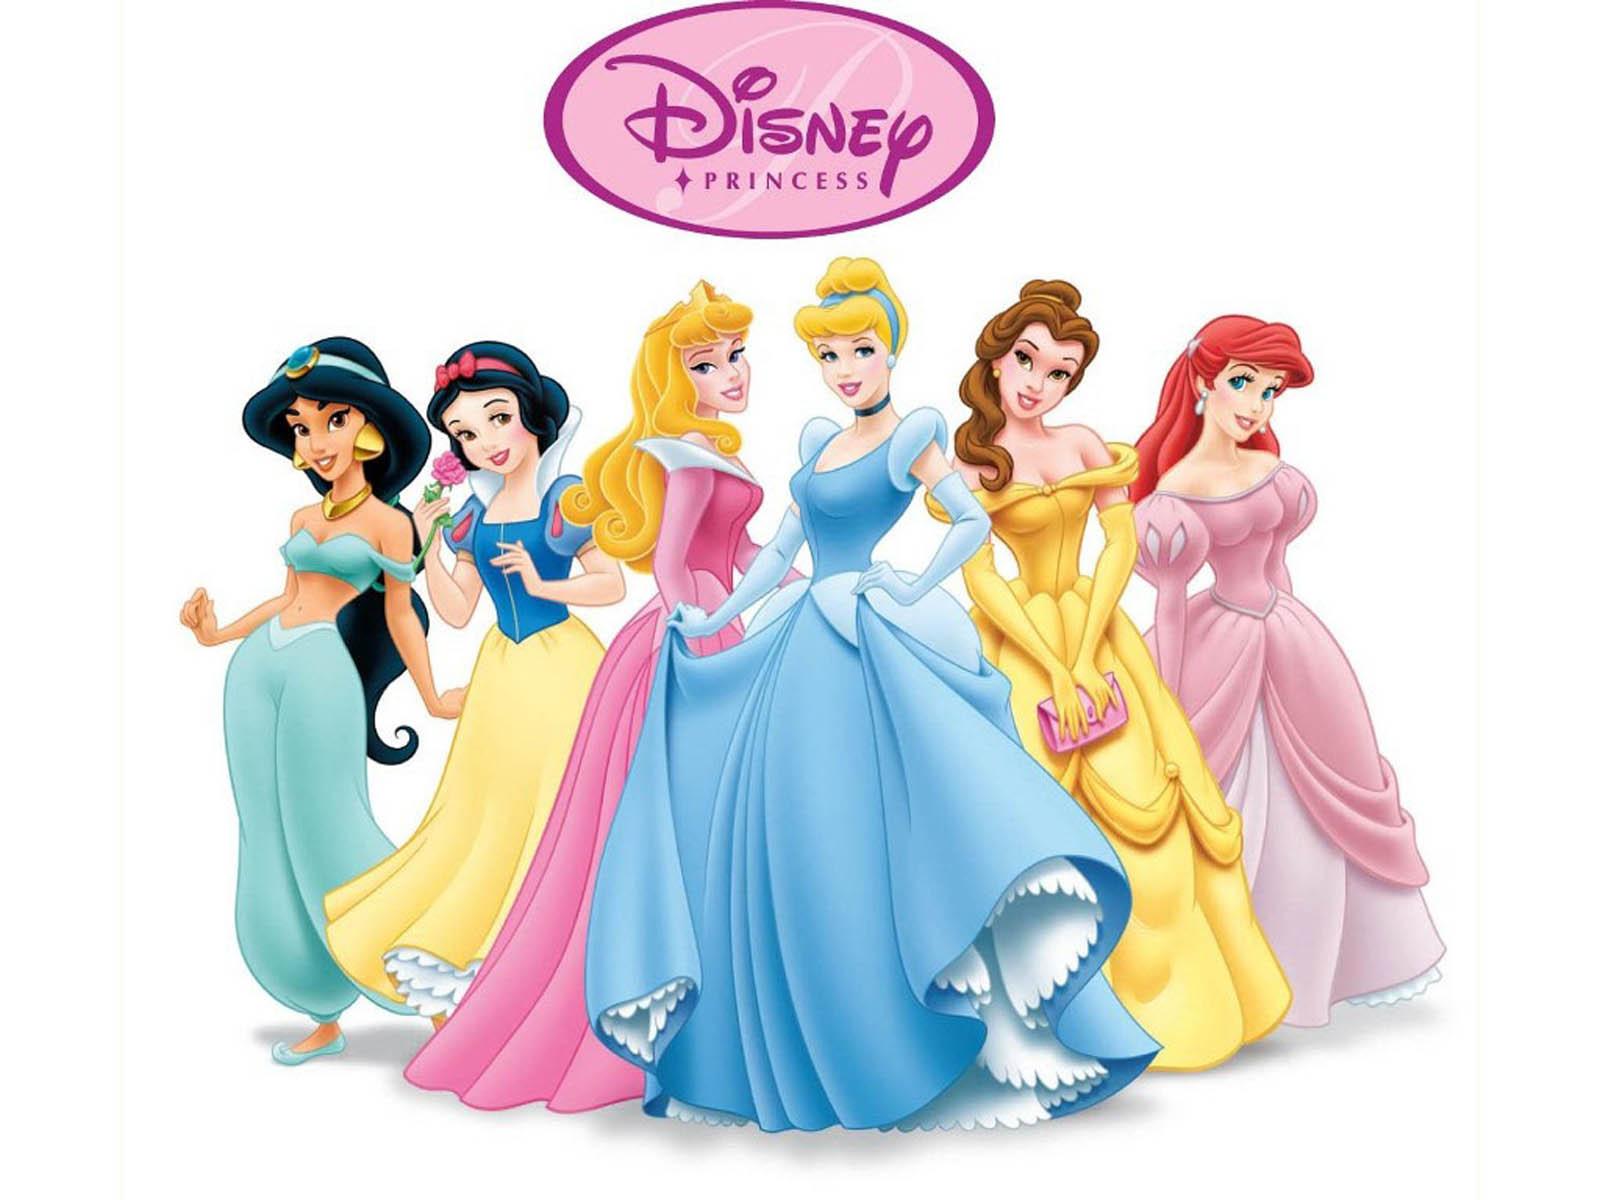 Princes of Disney: description and photo 98